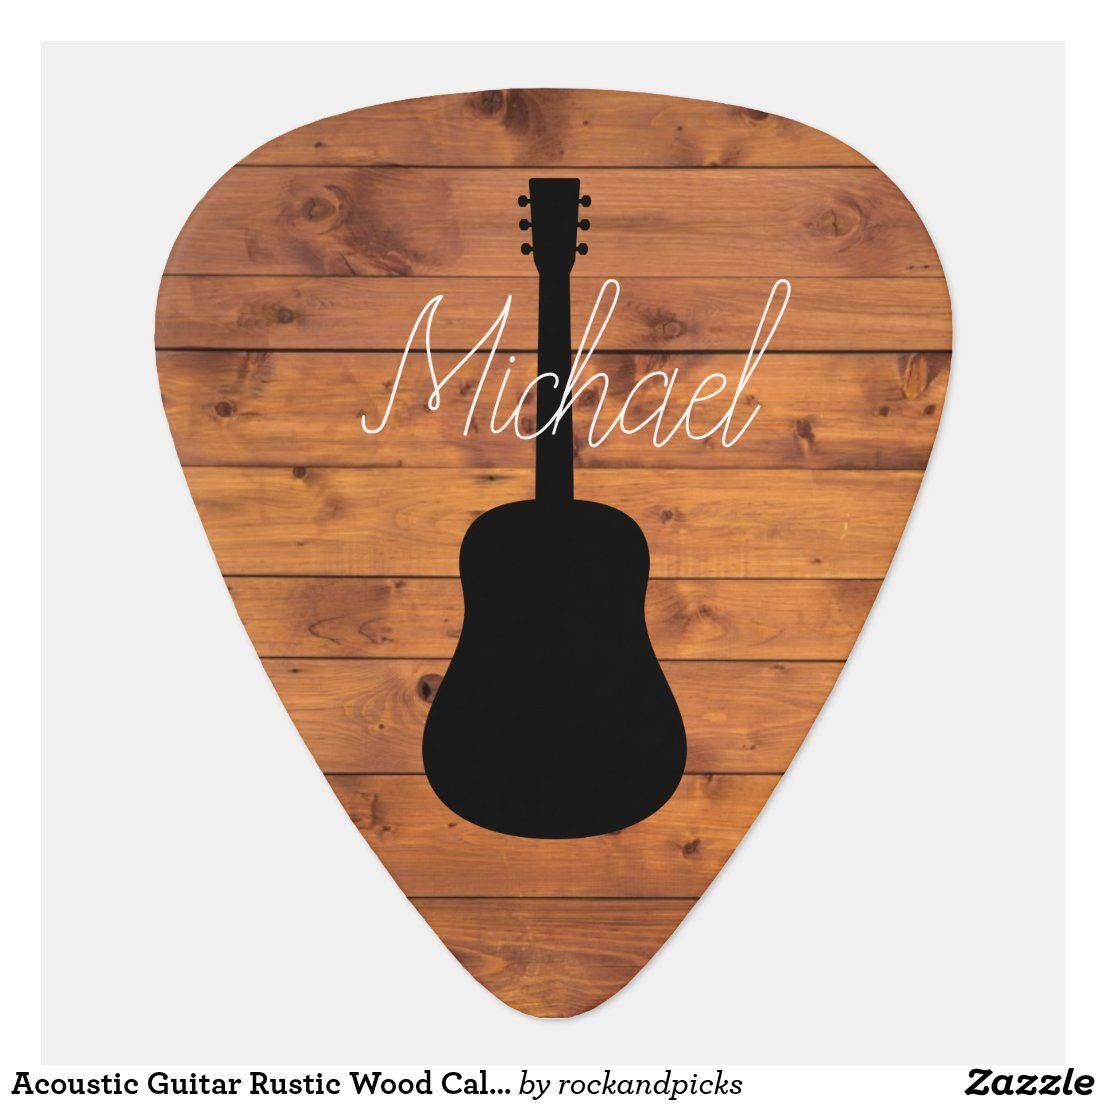 Acoustic Guitar Rustic Wood Calligraphy Name Guitar Pick Zazzle Com In 2021 Calligraphy Name Guitar Gifts Acoustic Guitar